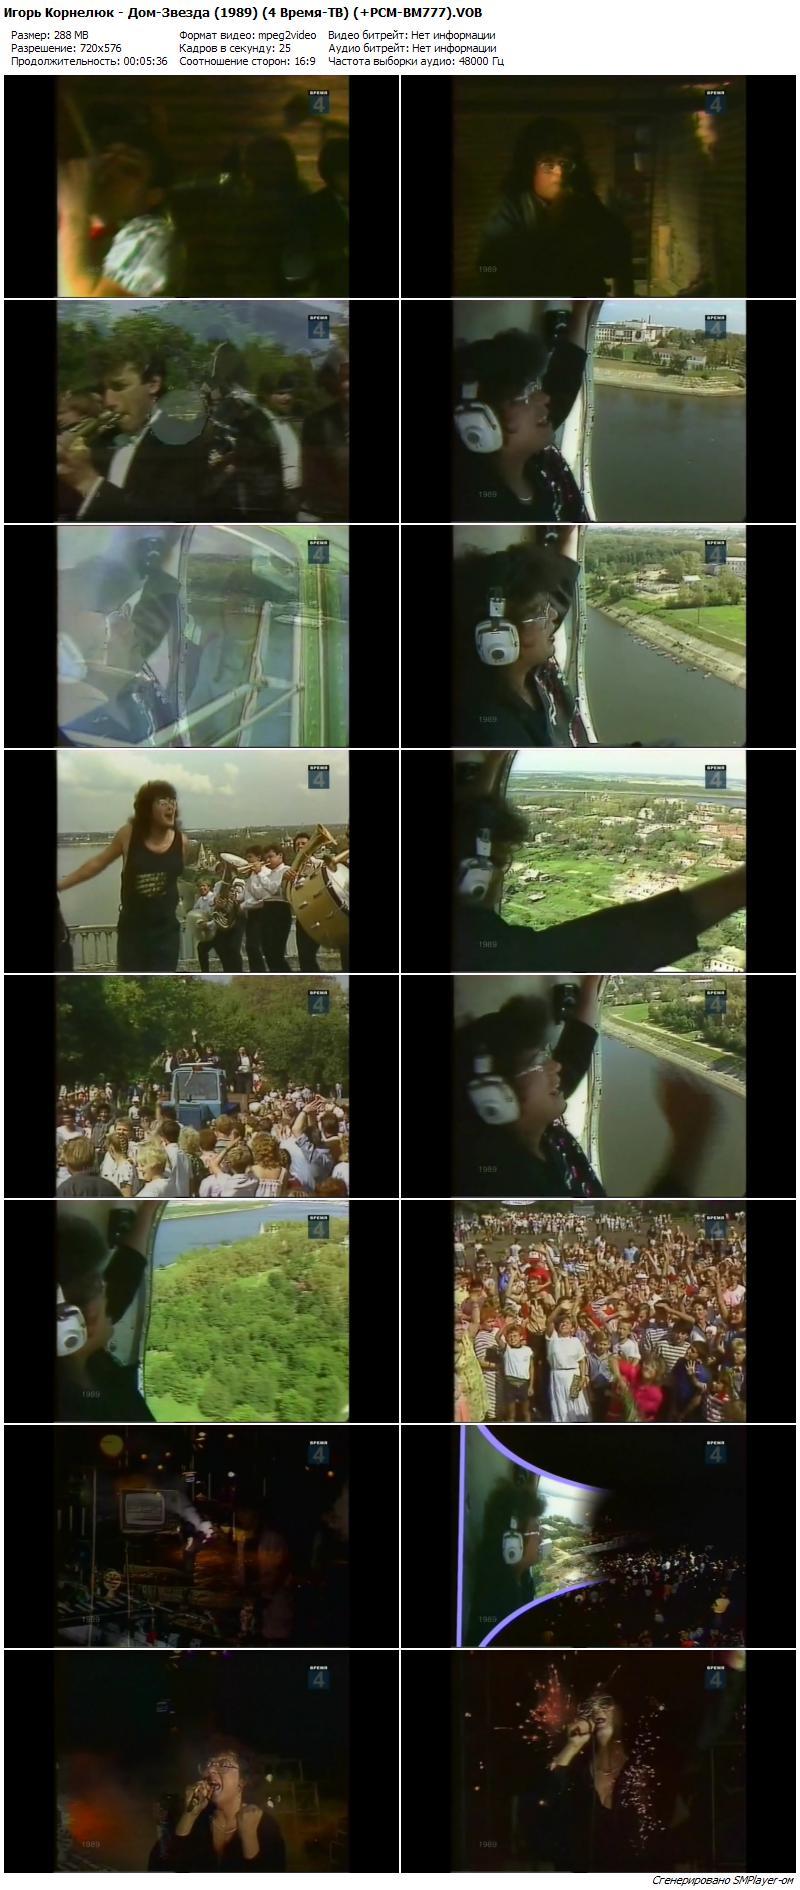 Игорь Корнелюк - Дом-Звезда (1989) (4 Время-ТВ) (+PCM-BM777)_preview.jpg